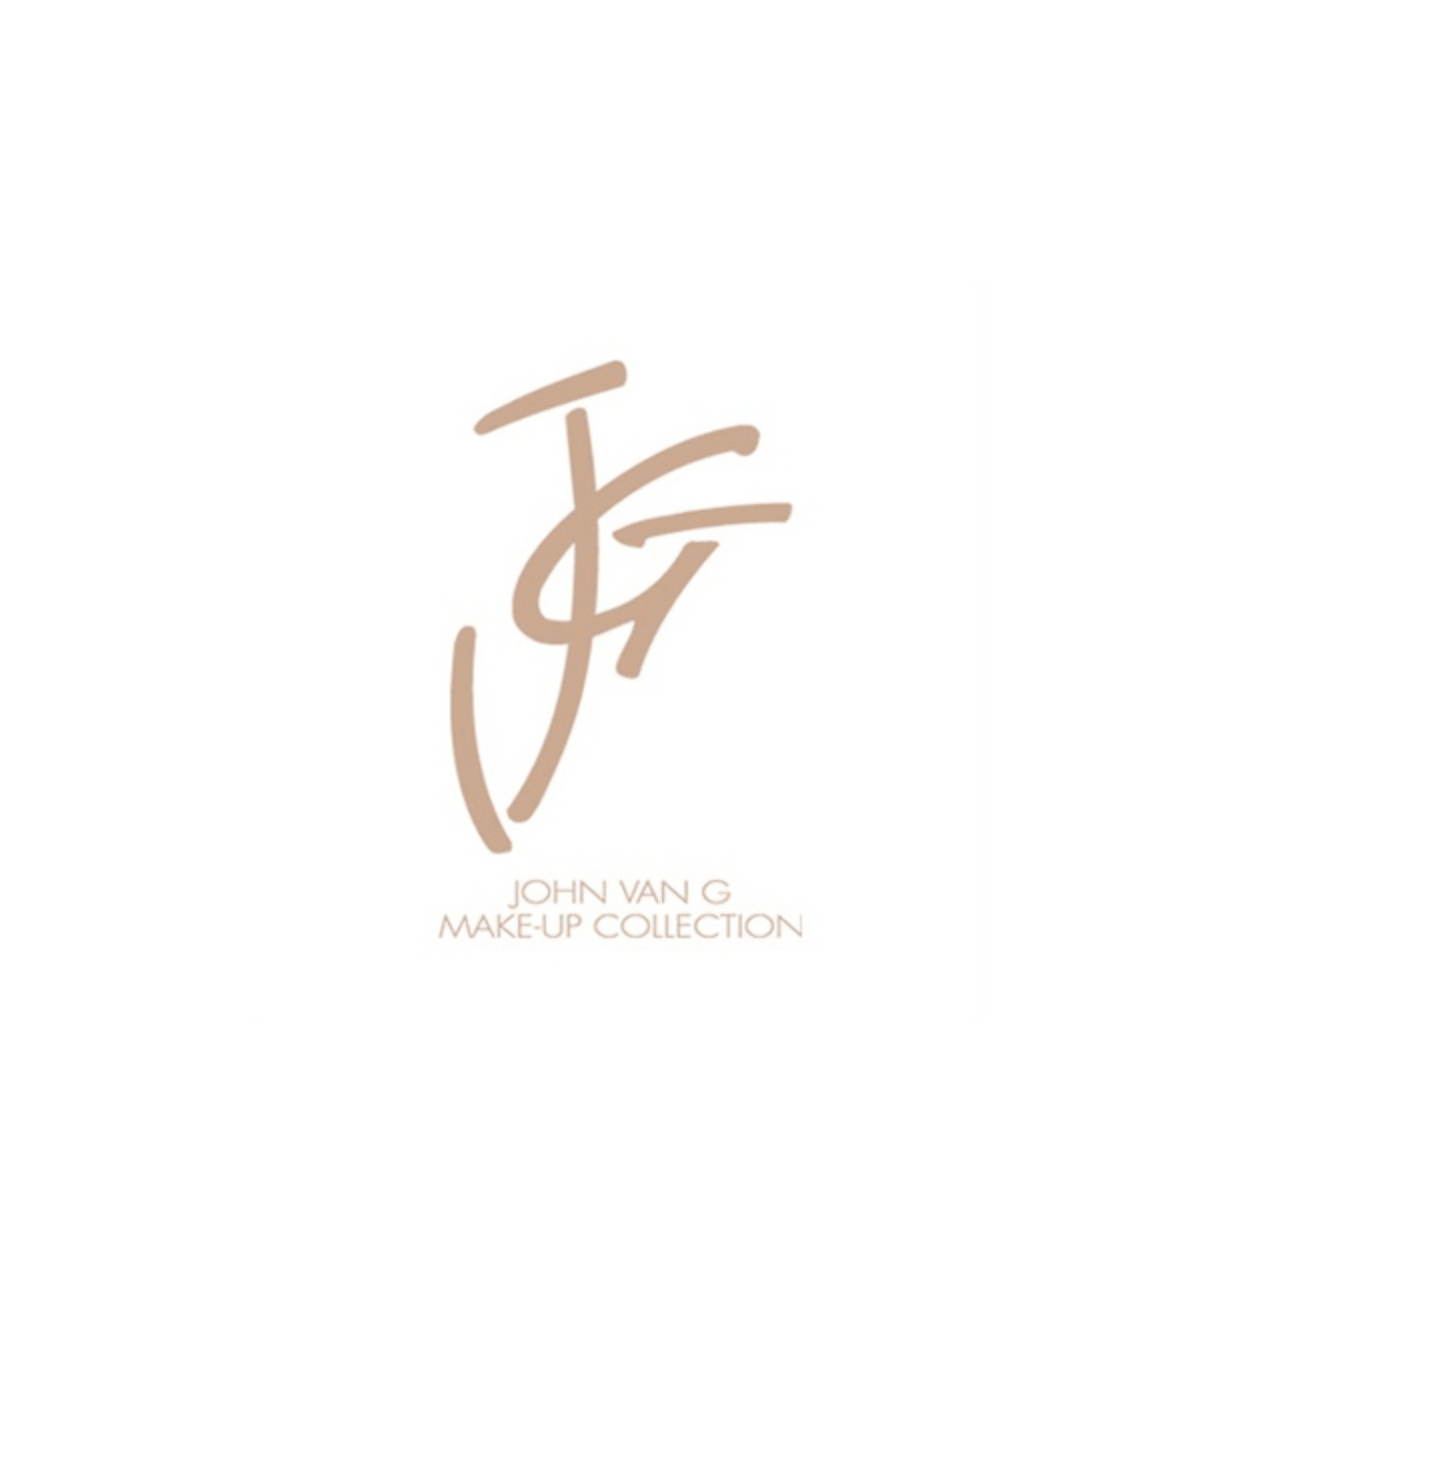 JohnvanG-min